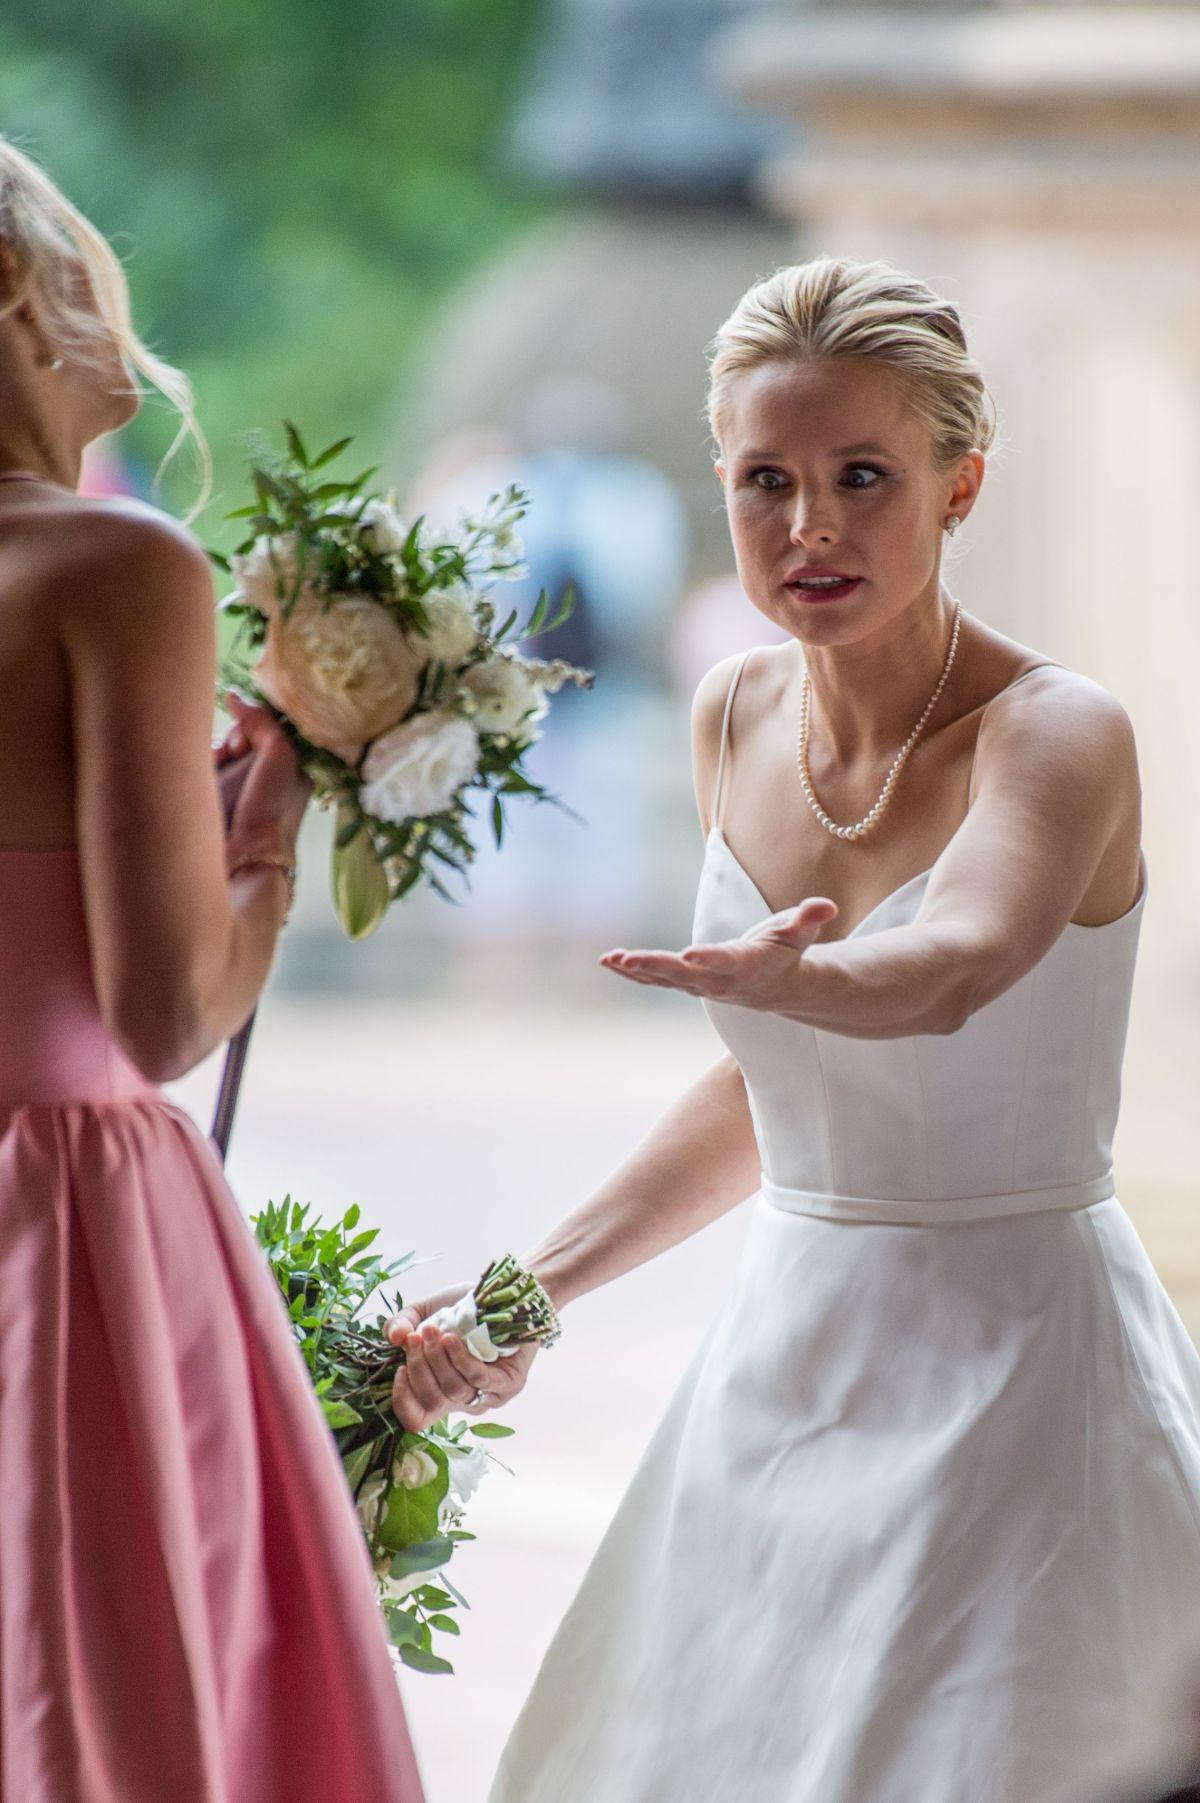 Kristen mascia wedding